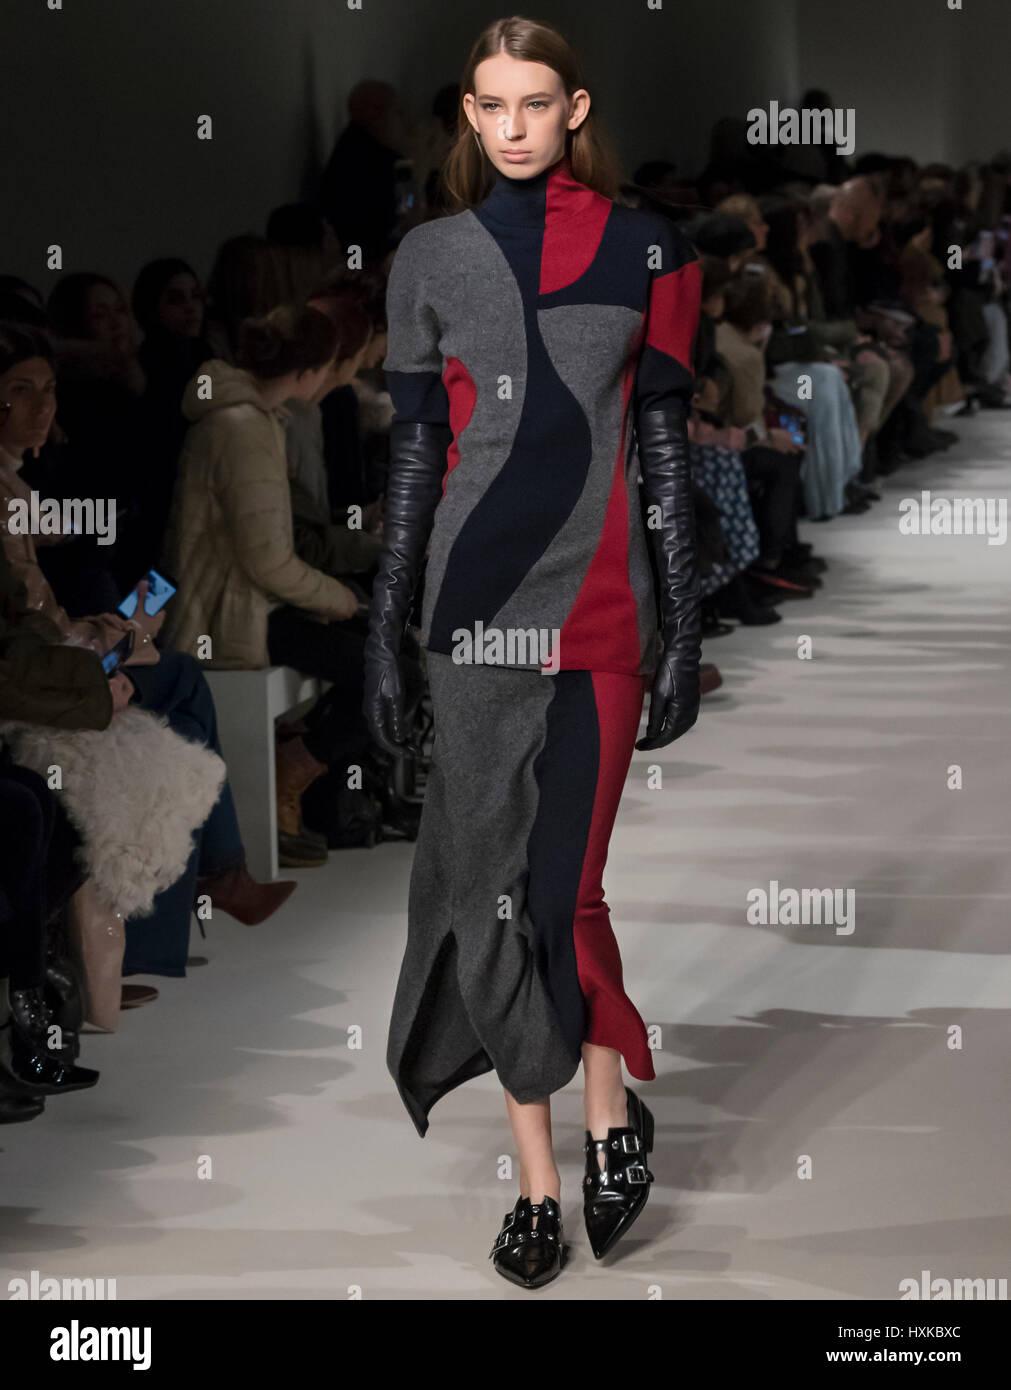 NEW YORK, NY - FEBRUARY 12, 2017: Kerrigan Clark walks the runway at the Victoria Beckham Fall Winter 2017 fashion - Stock Image